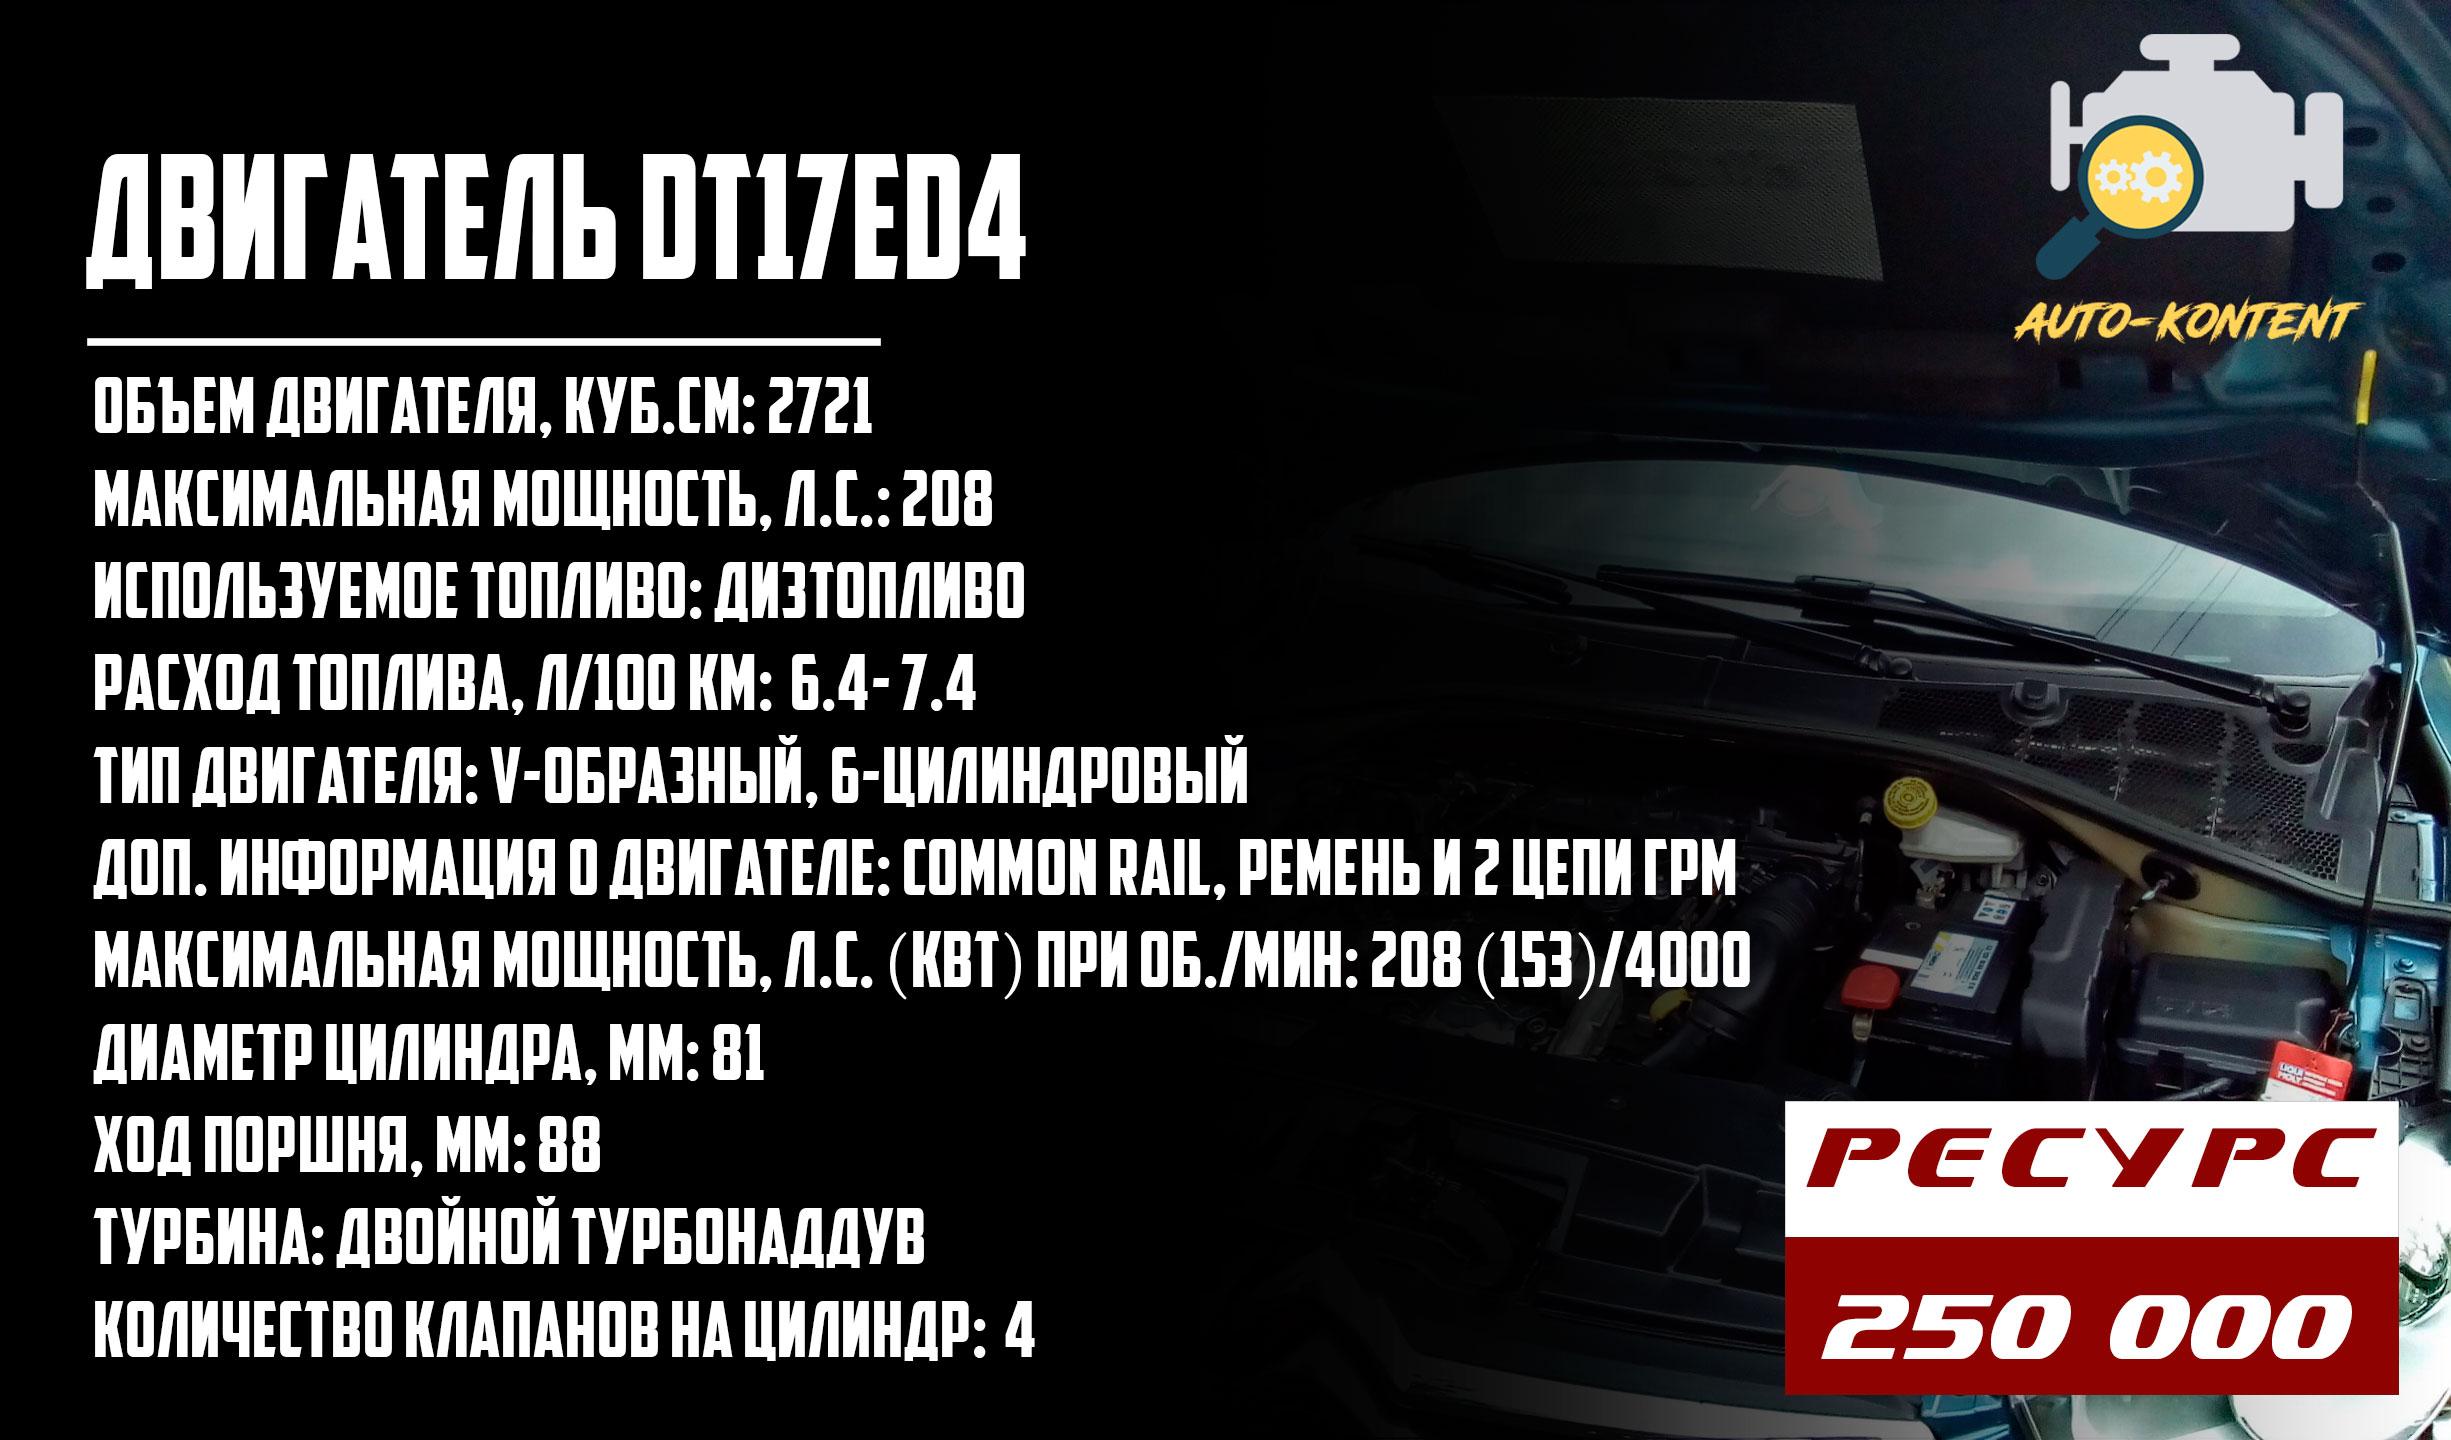 DT17ED4